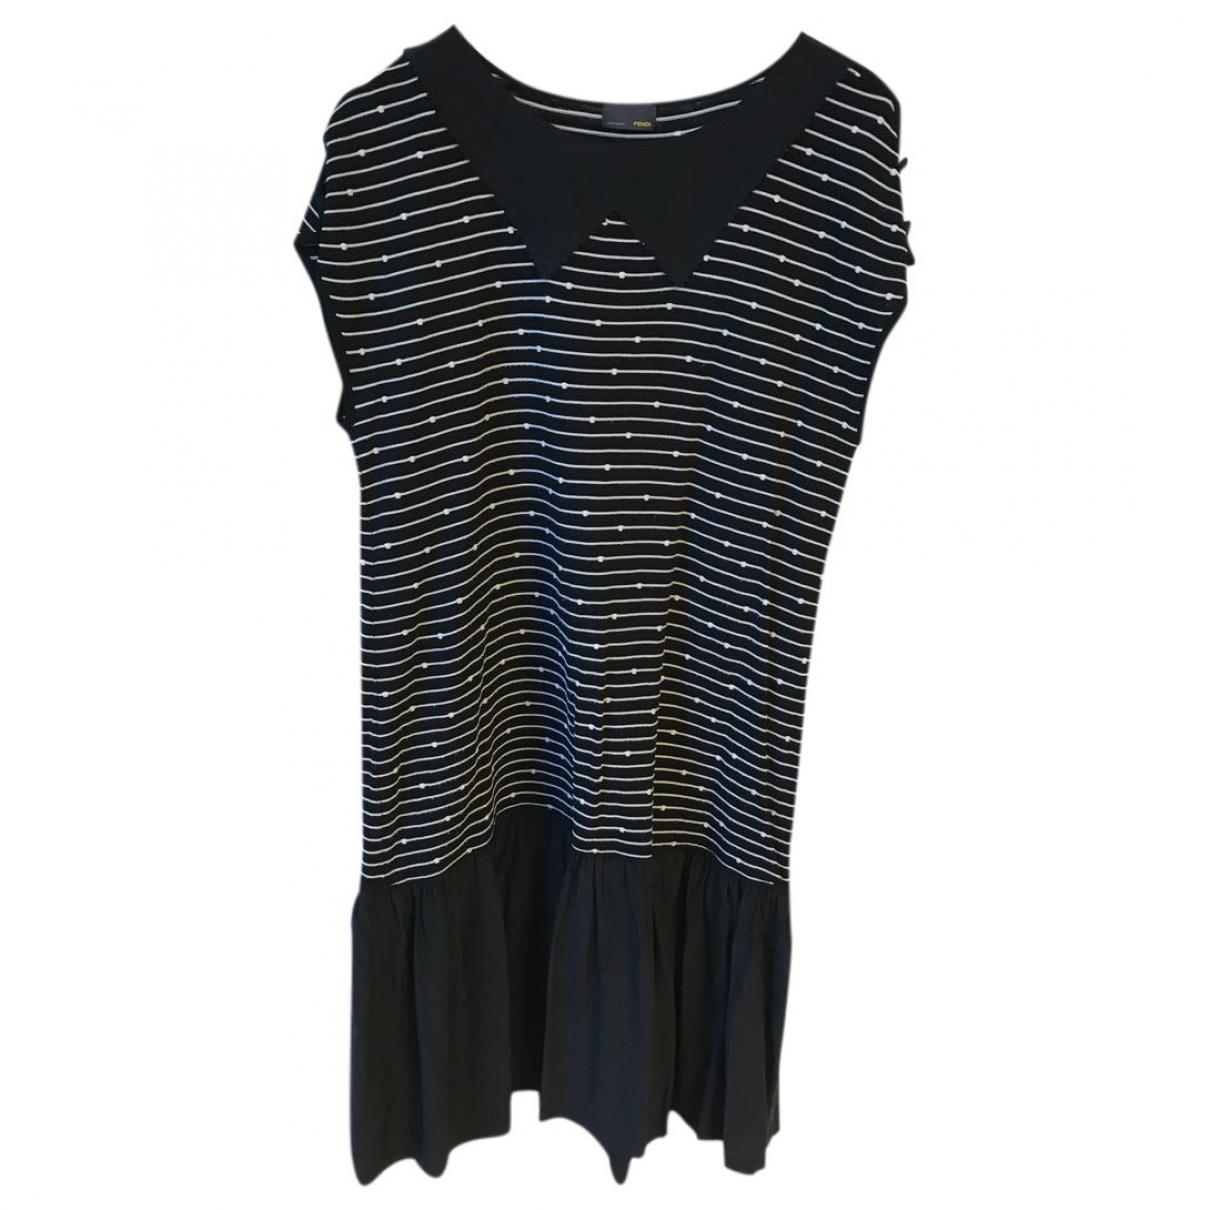 Fendi \N Kleid in  Schwarz Synthetik